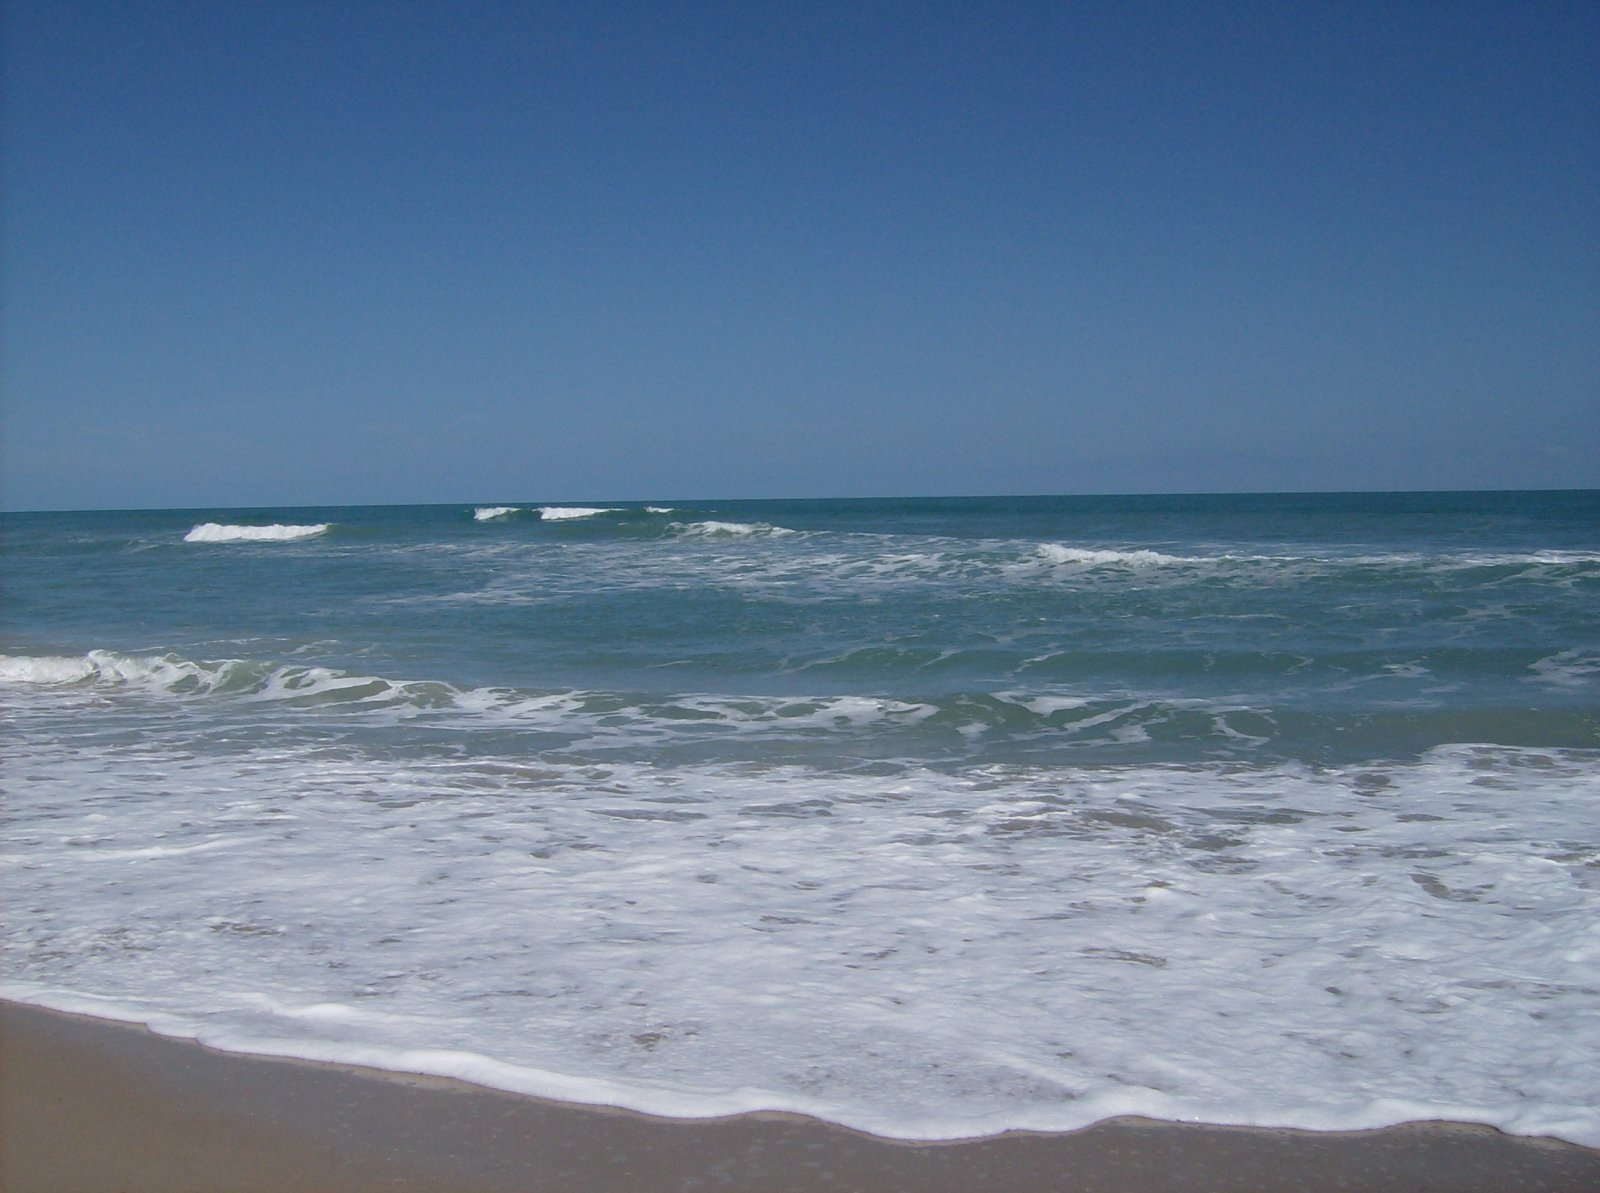 Click image for larger version  Name:Playalina Beach & Florida Gators 003.jpg Views:87 Size:229.5 KB ID:153343